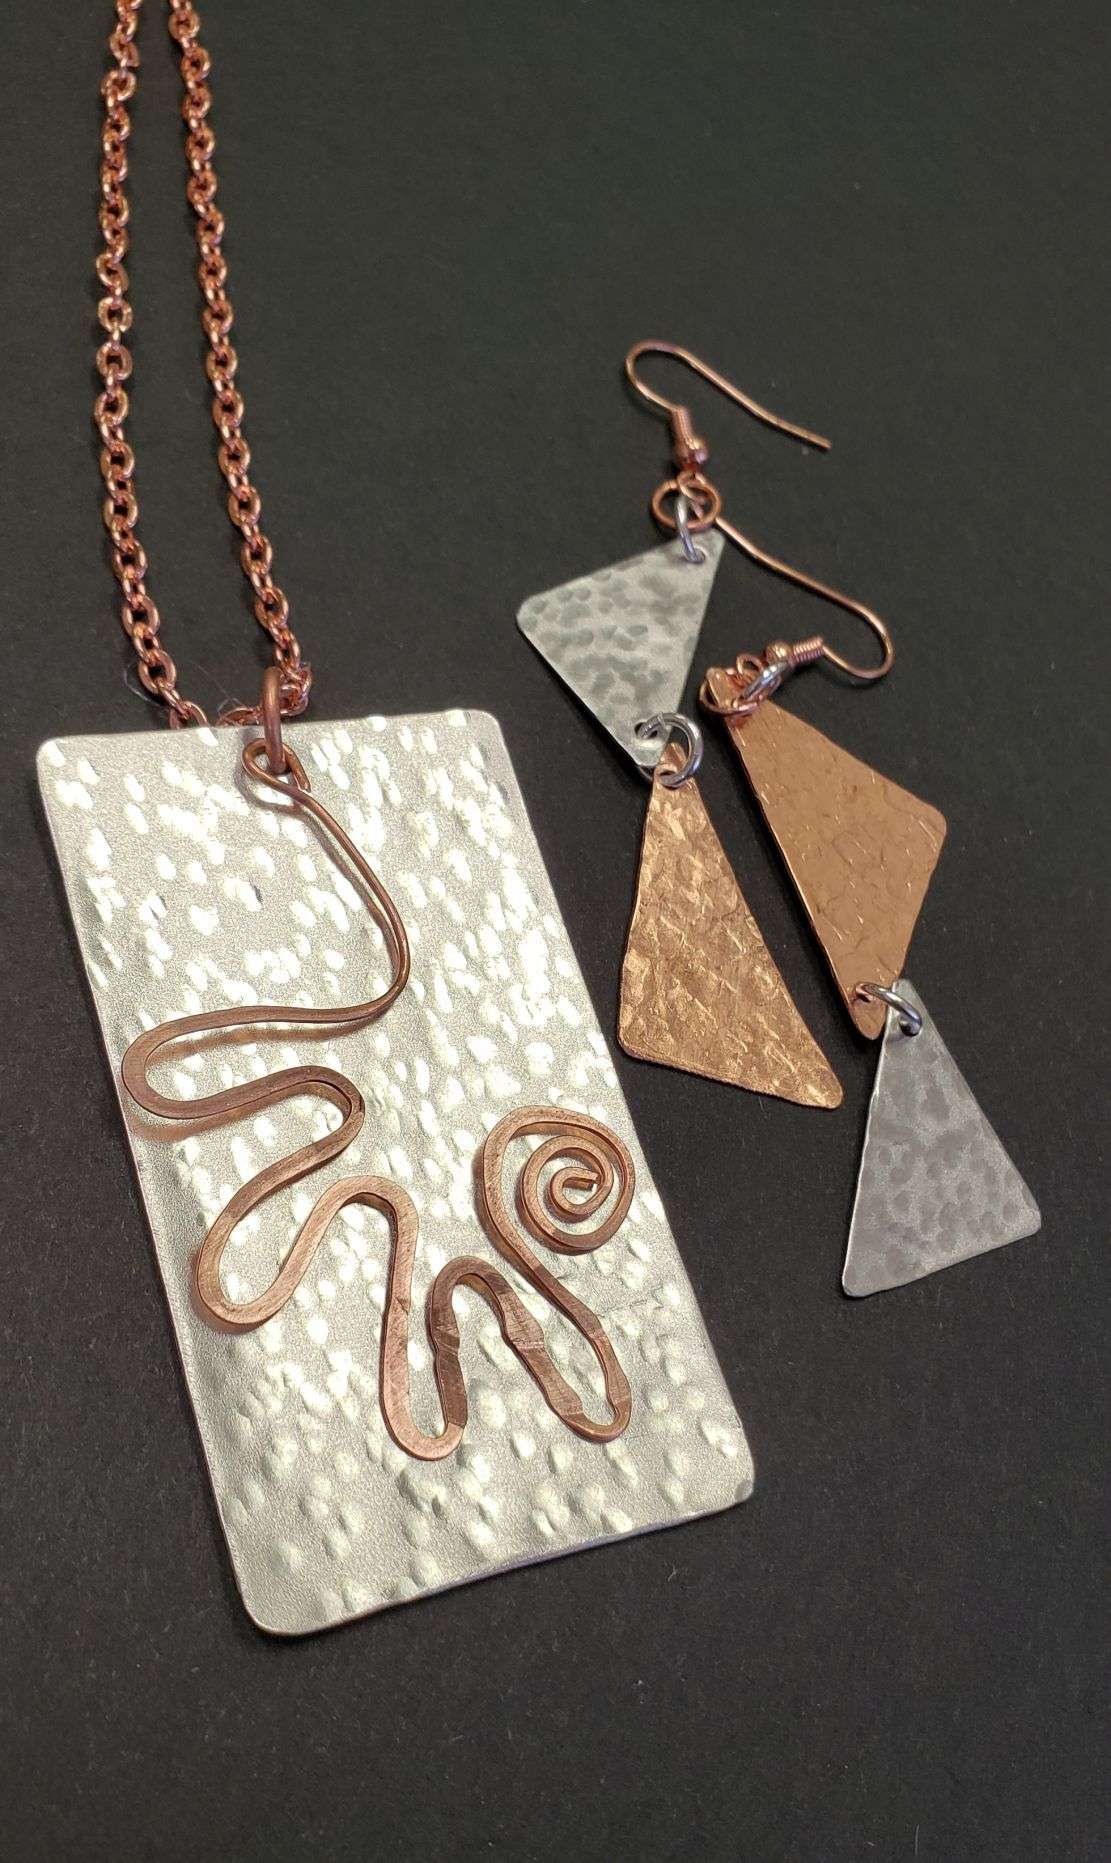 Jewelry by Susie Rodriguez